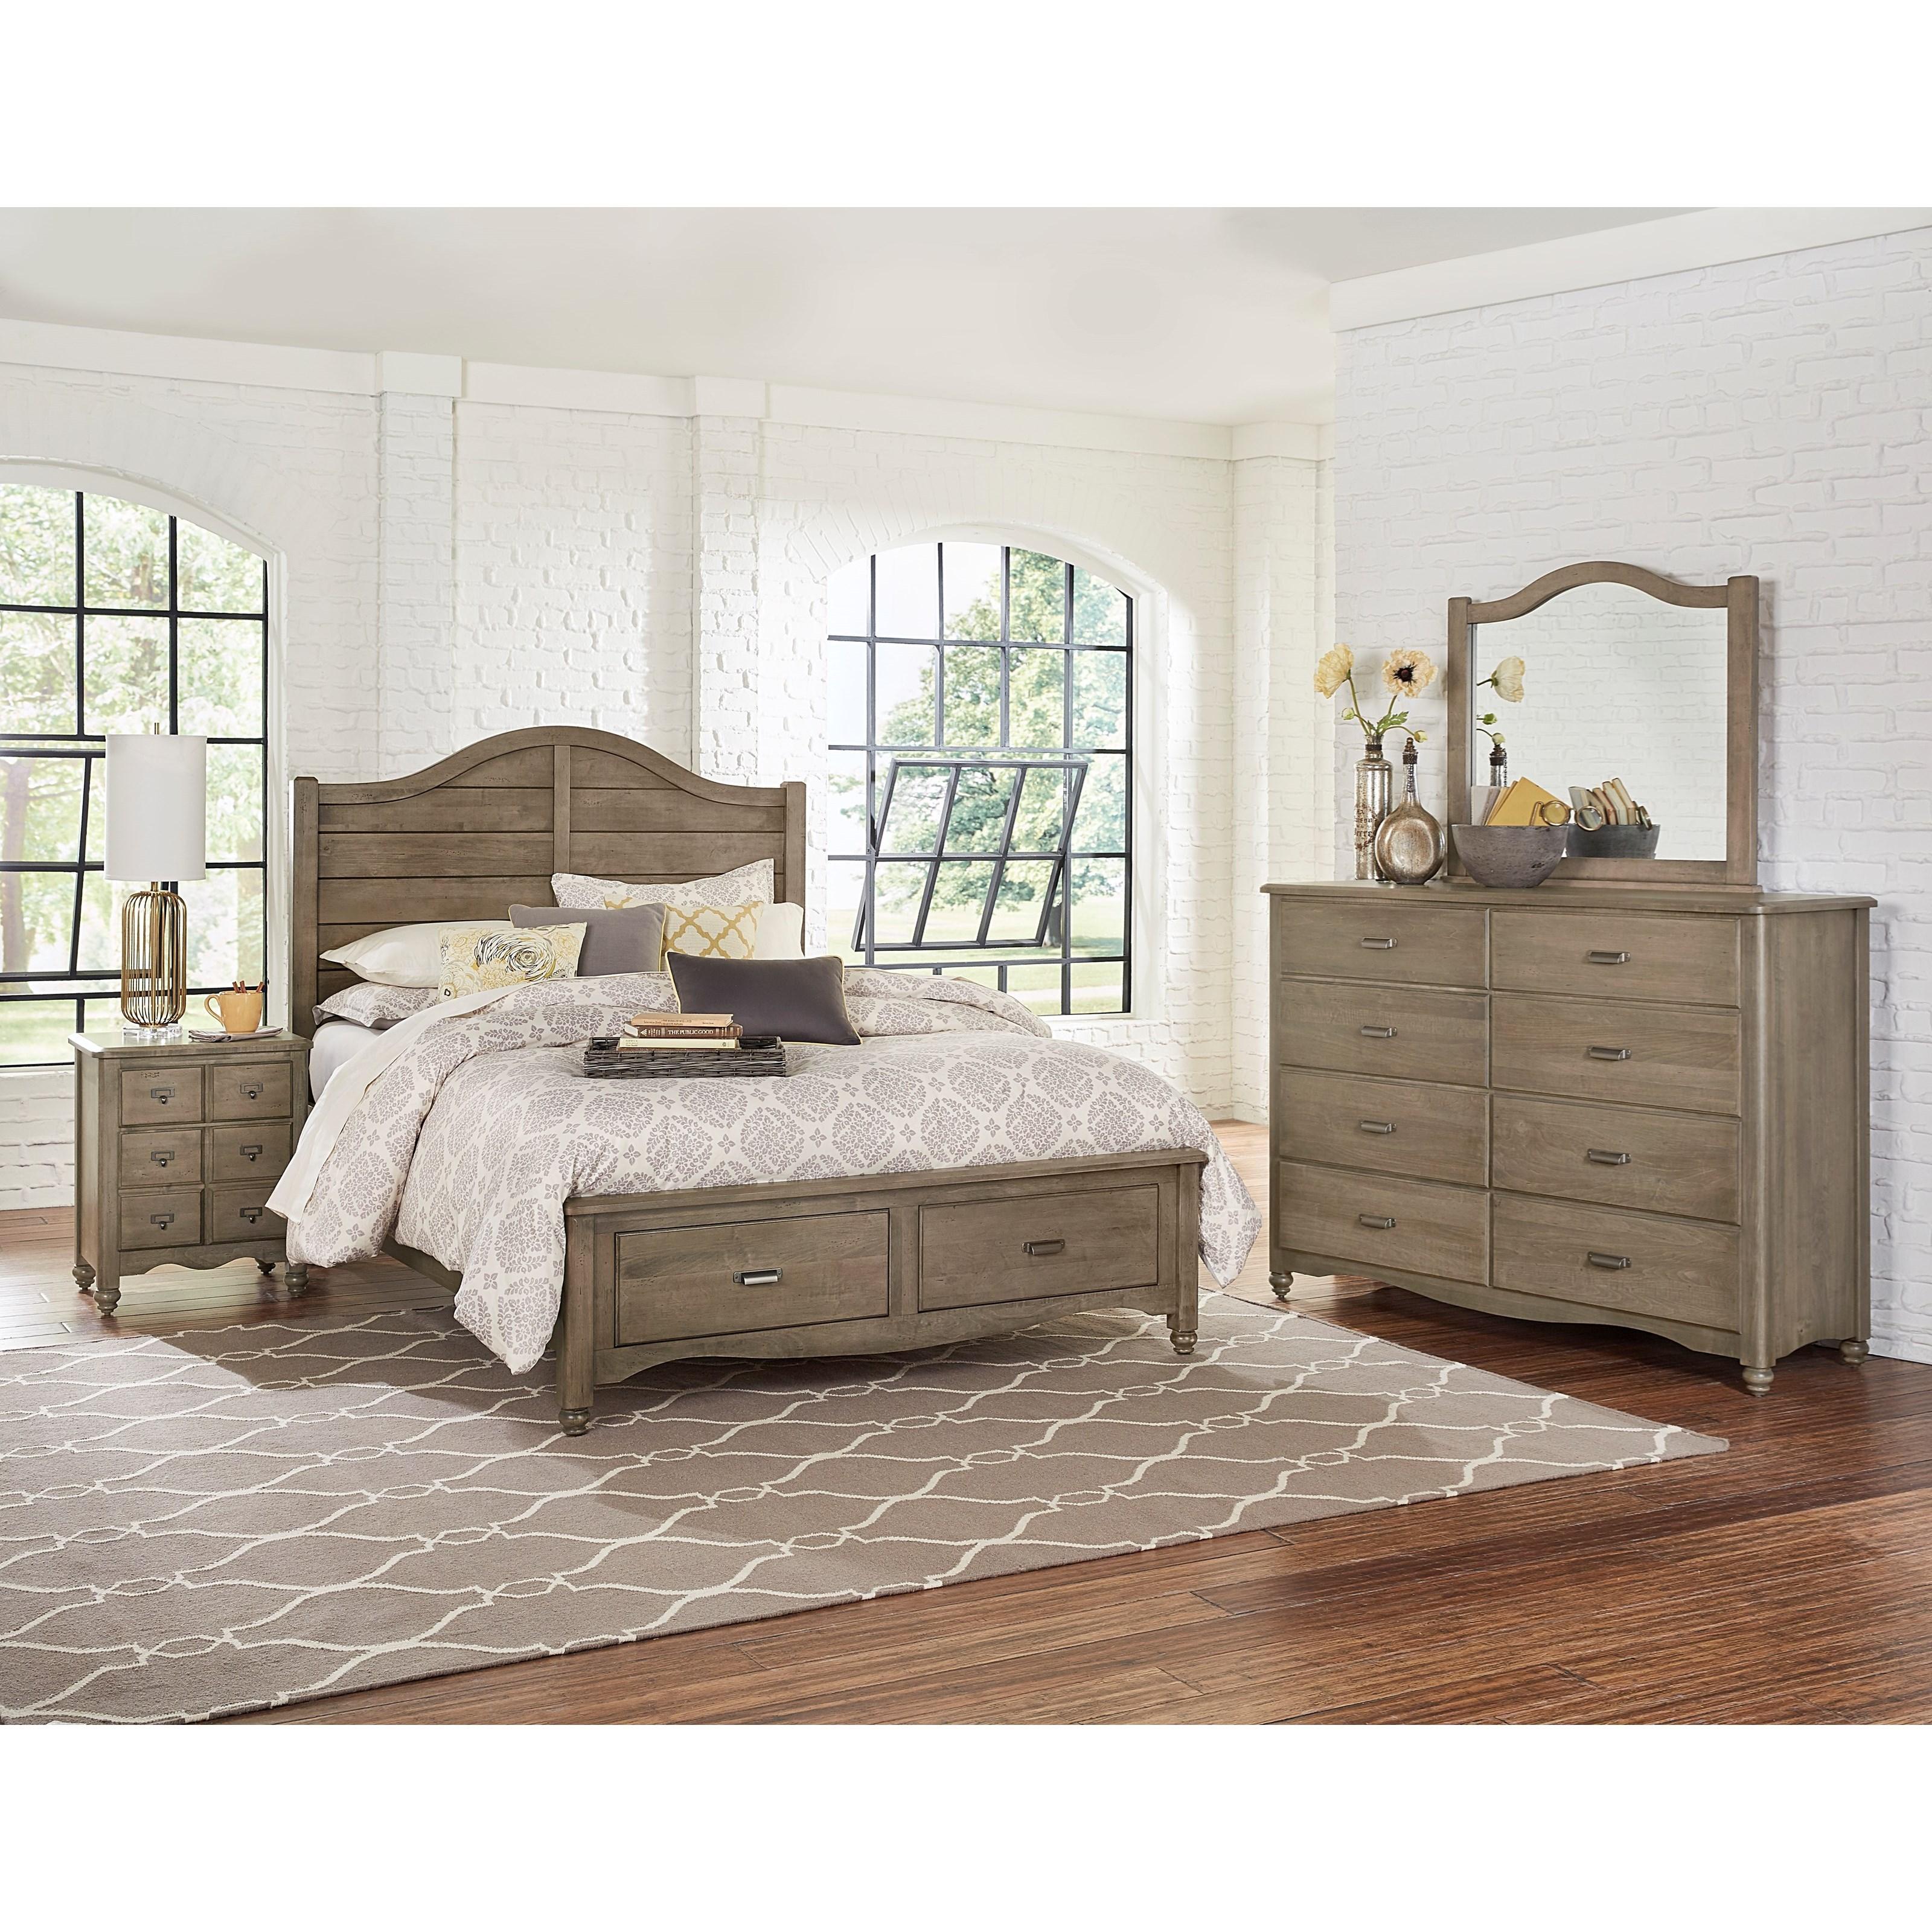 Vaughan bassett american maple king bedroom group value for American furniture king bedroom sets